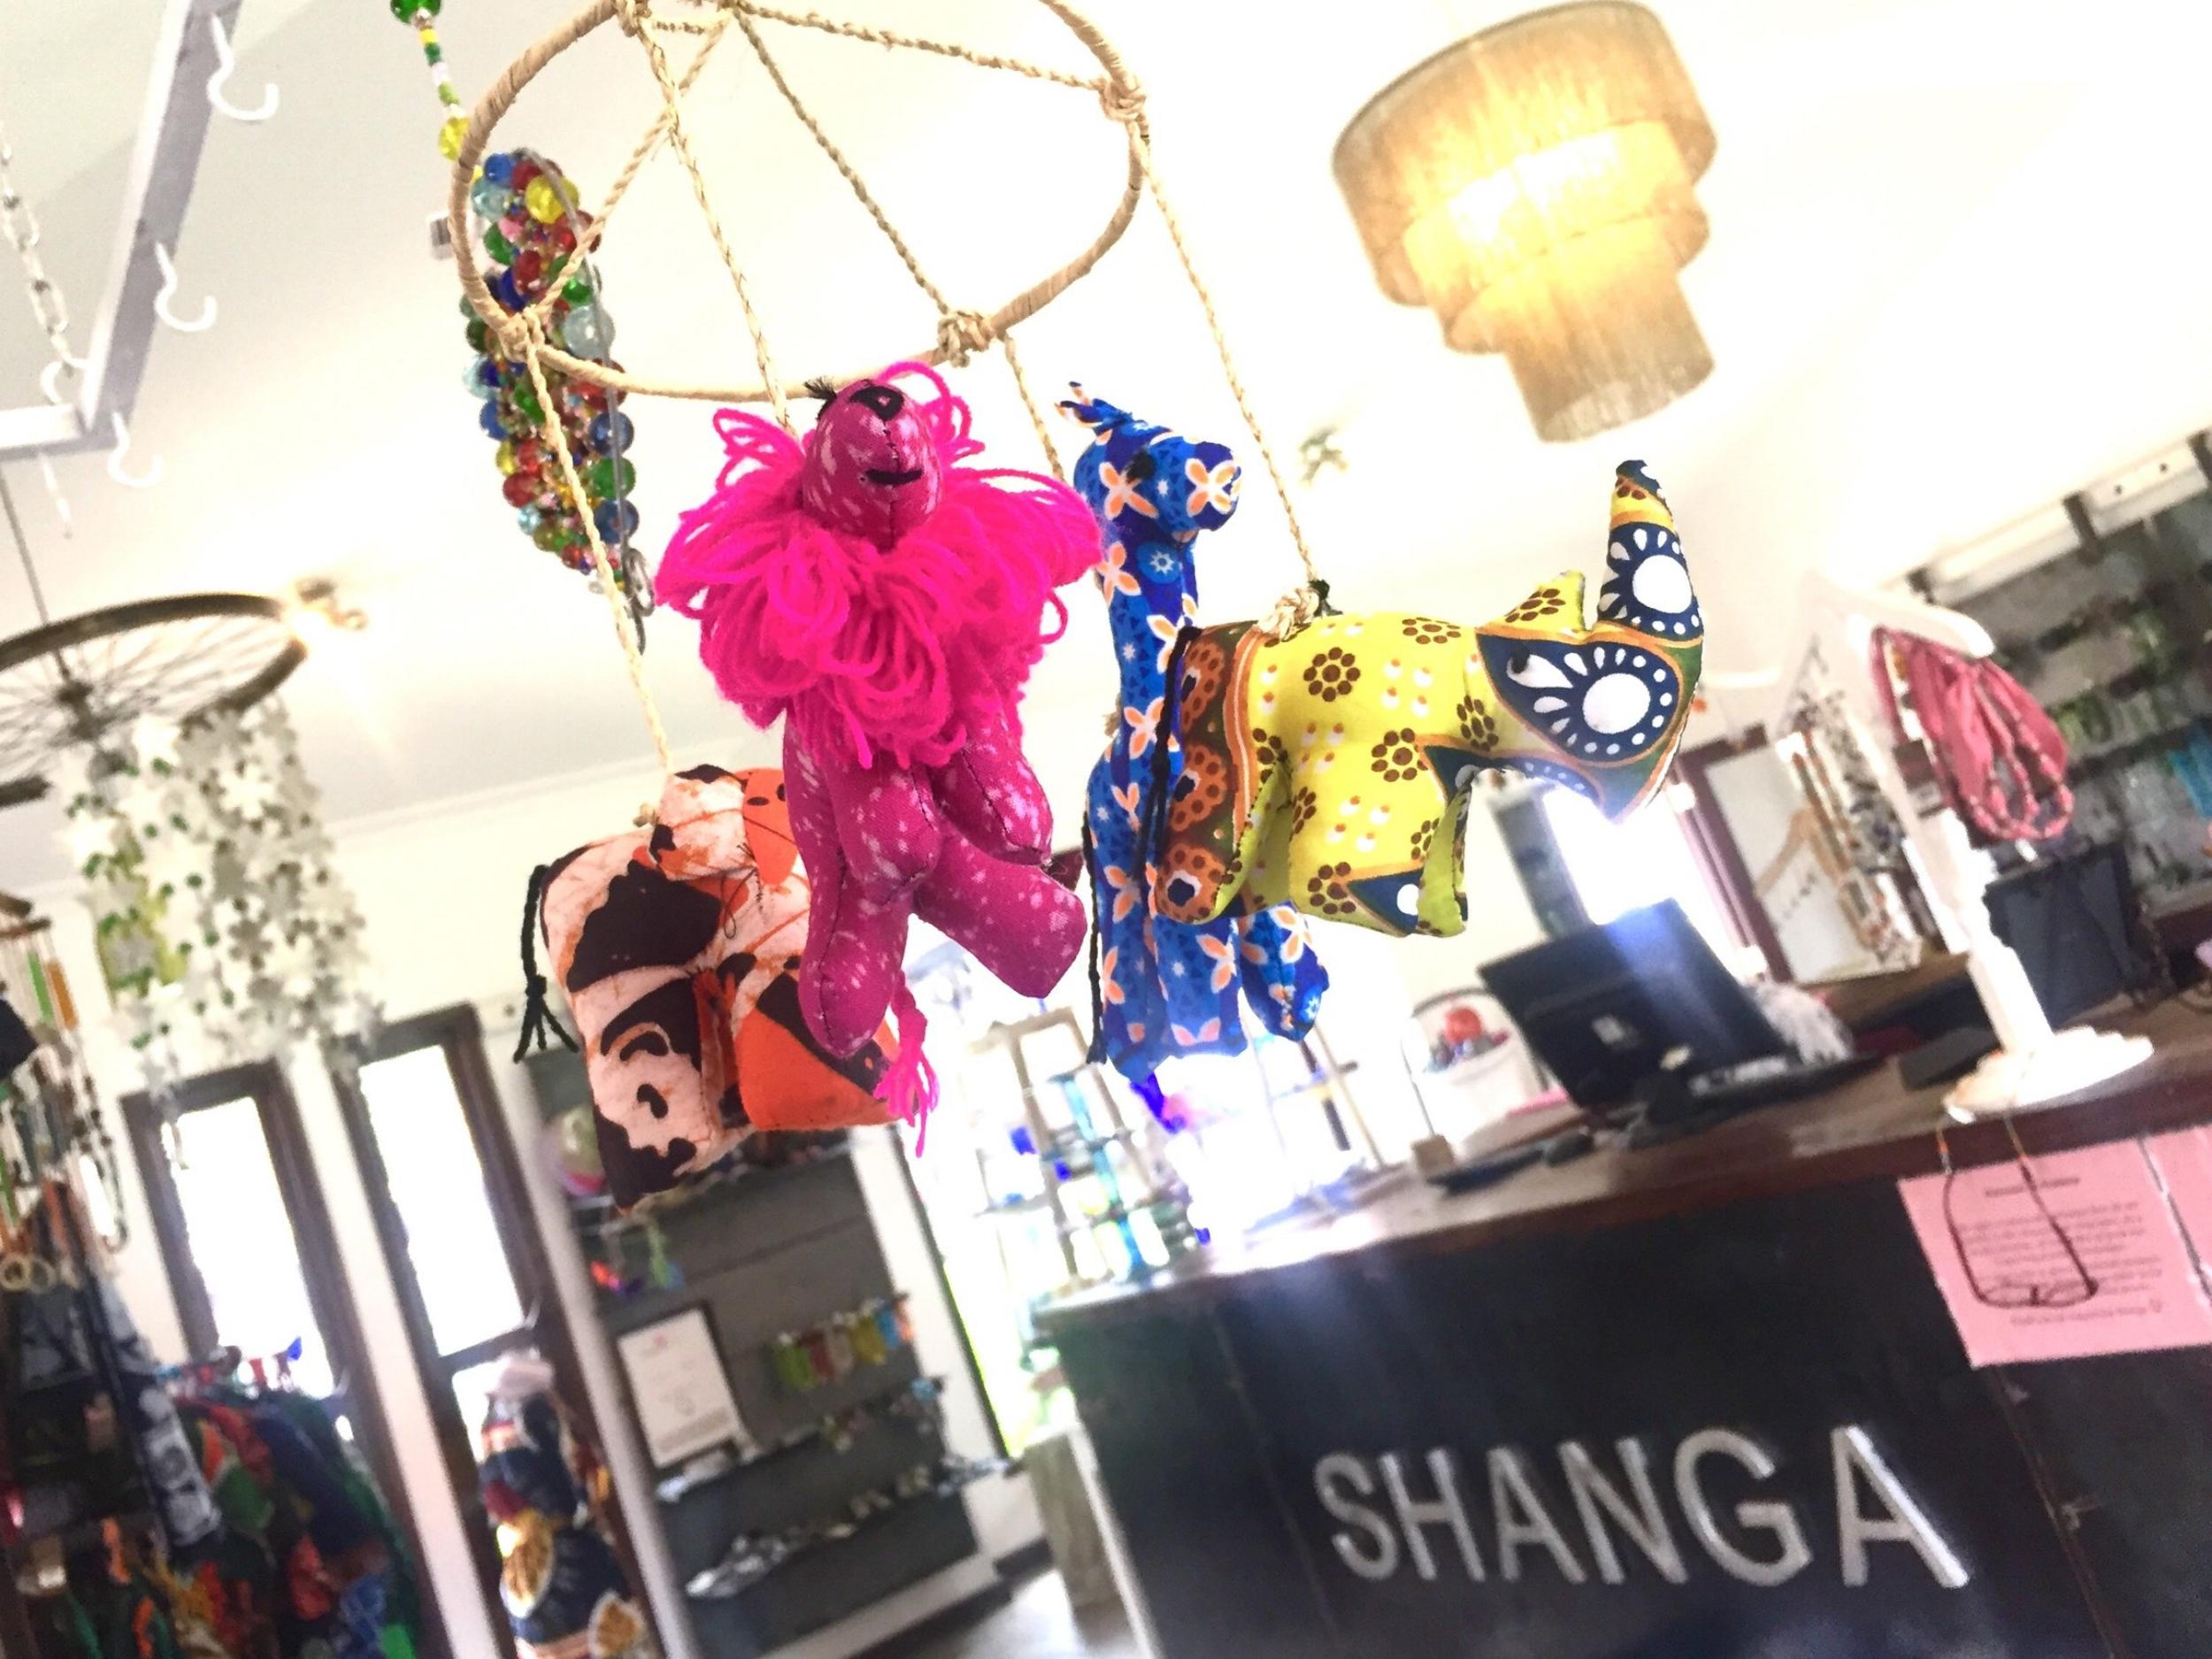 SHOP — SHANGA